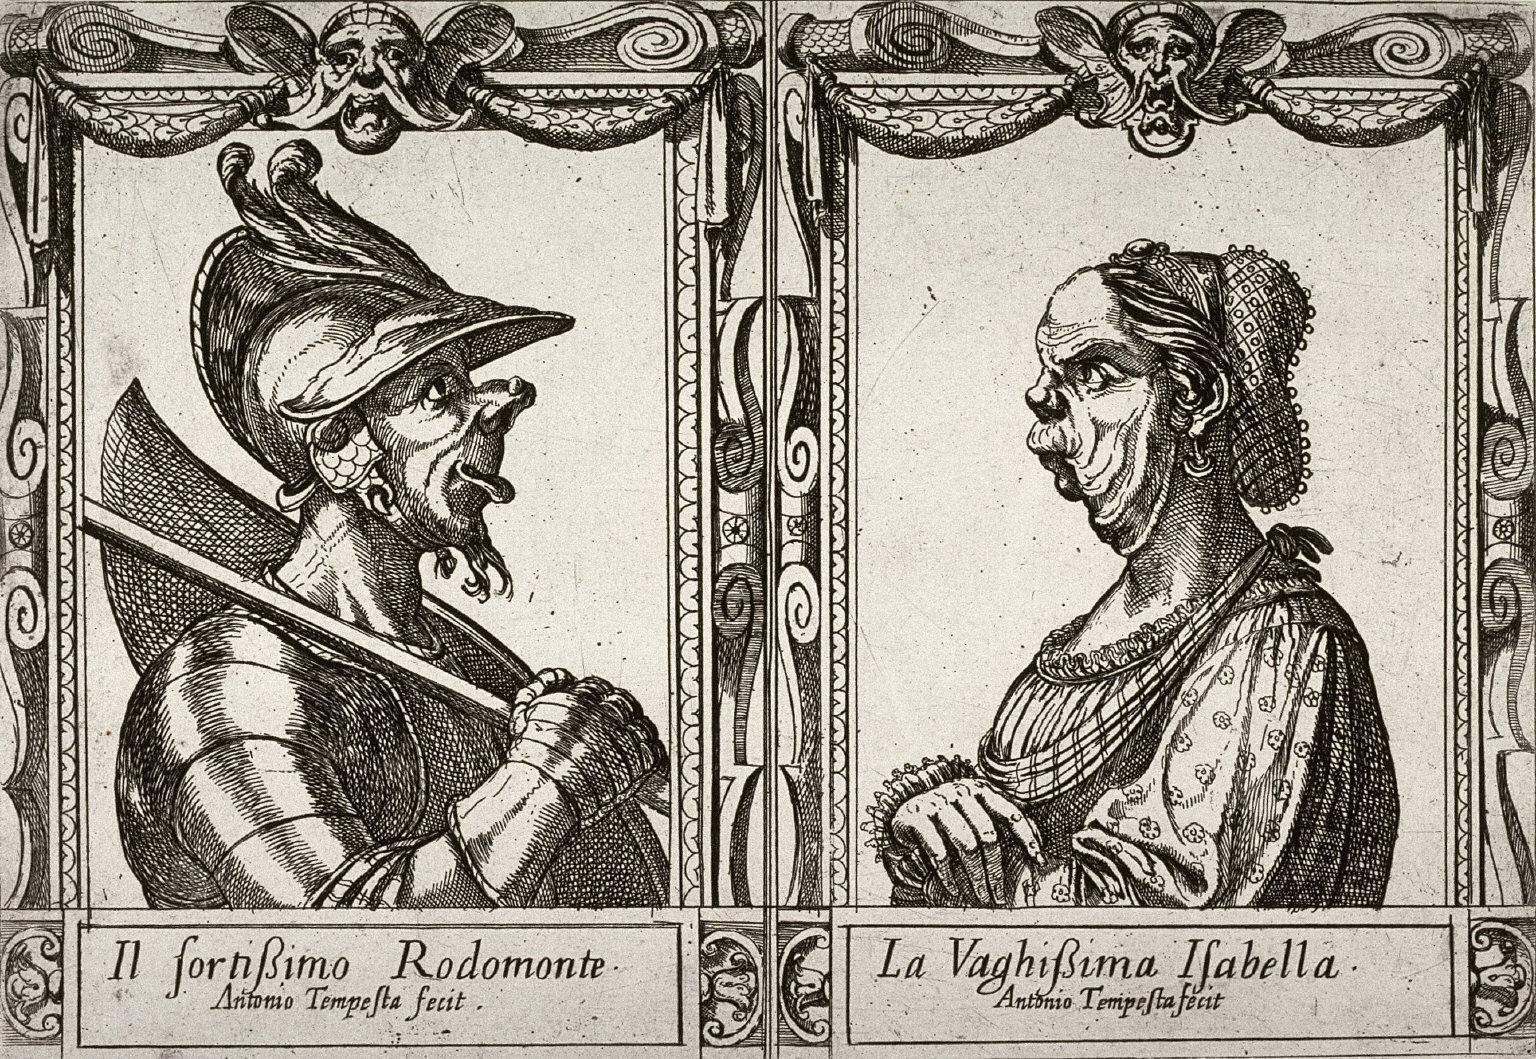 Il Fontissimo Rodomonte and La Vaghissima Isabella, from the series based on Ariosto's Orlando Furioso